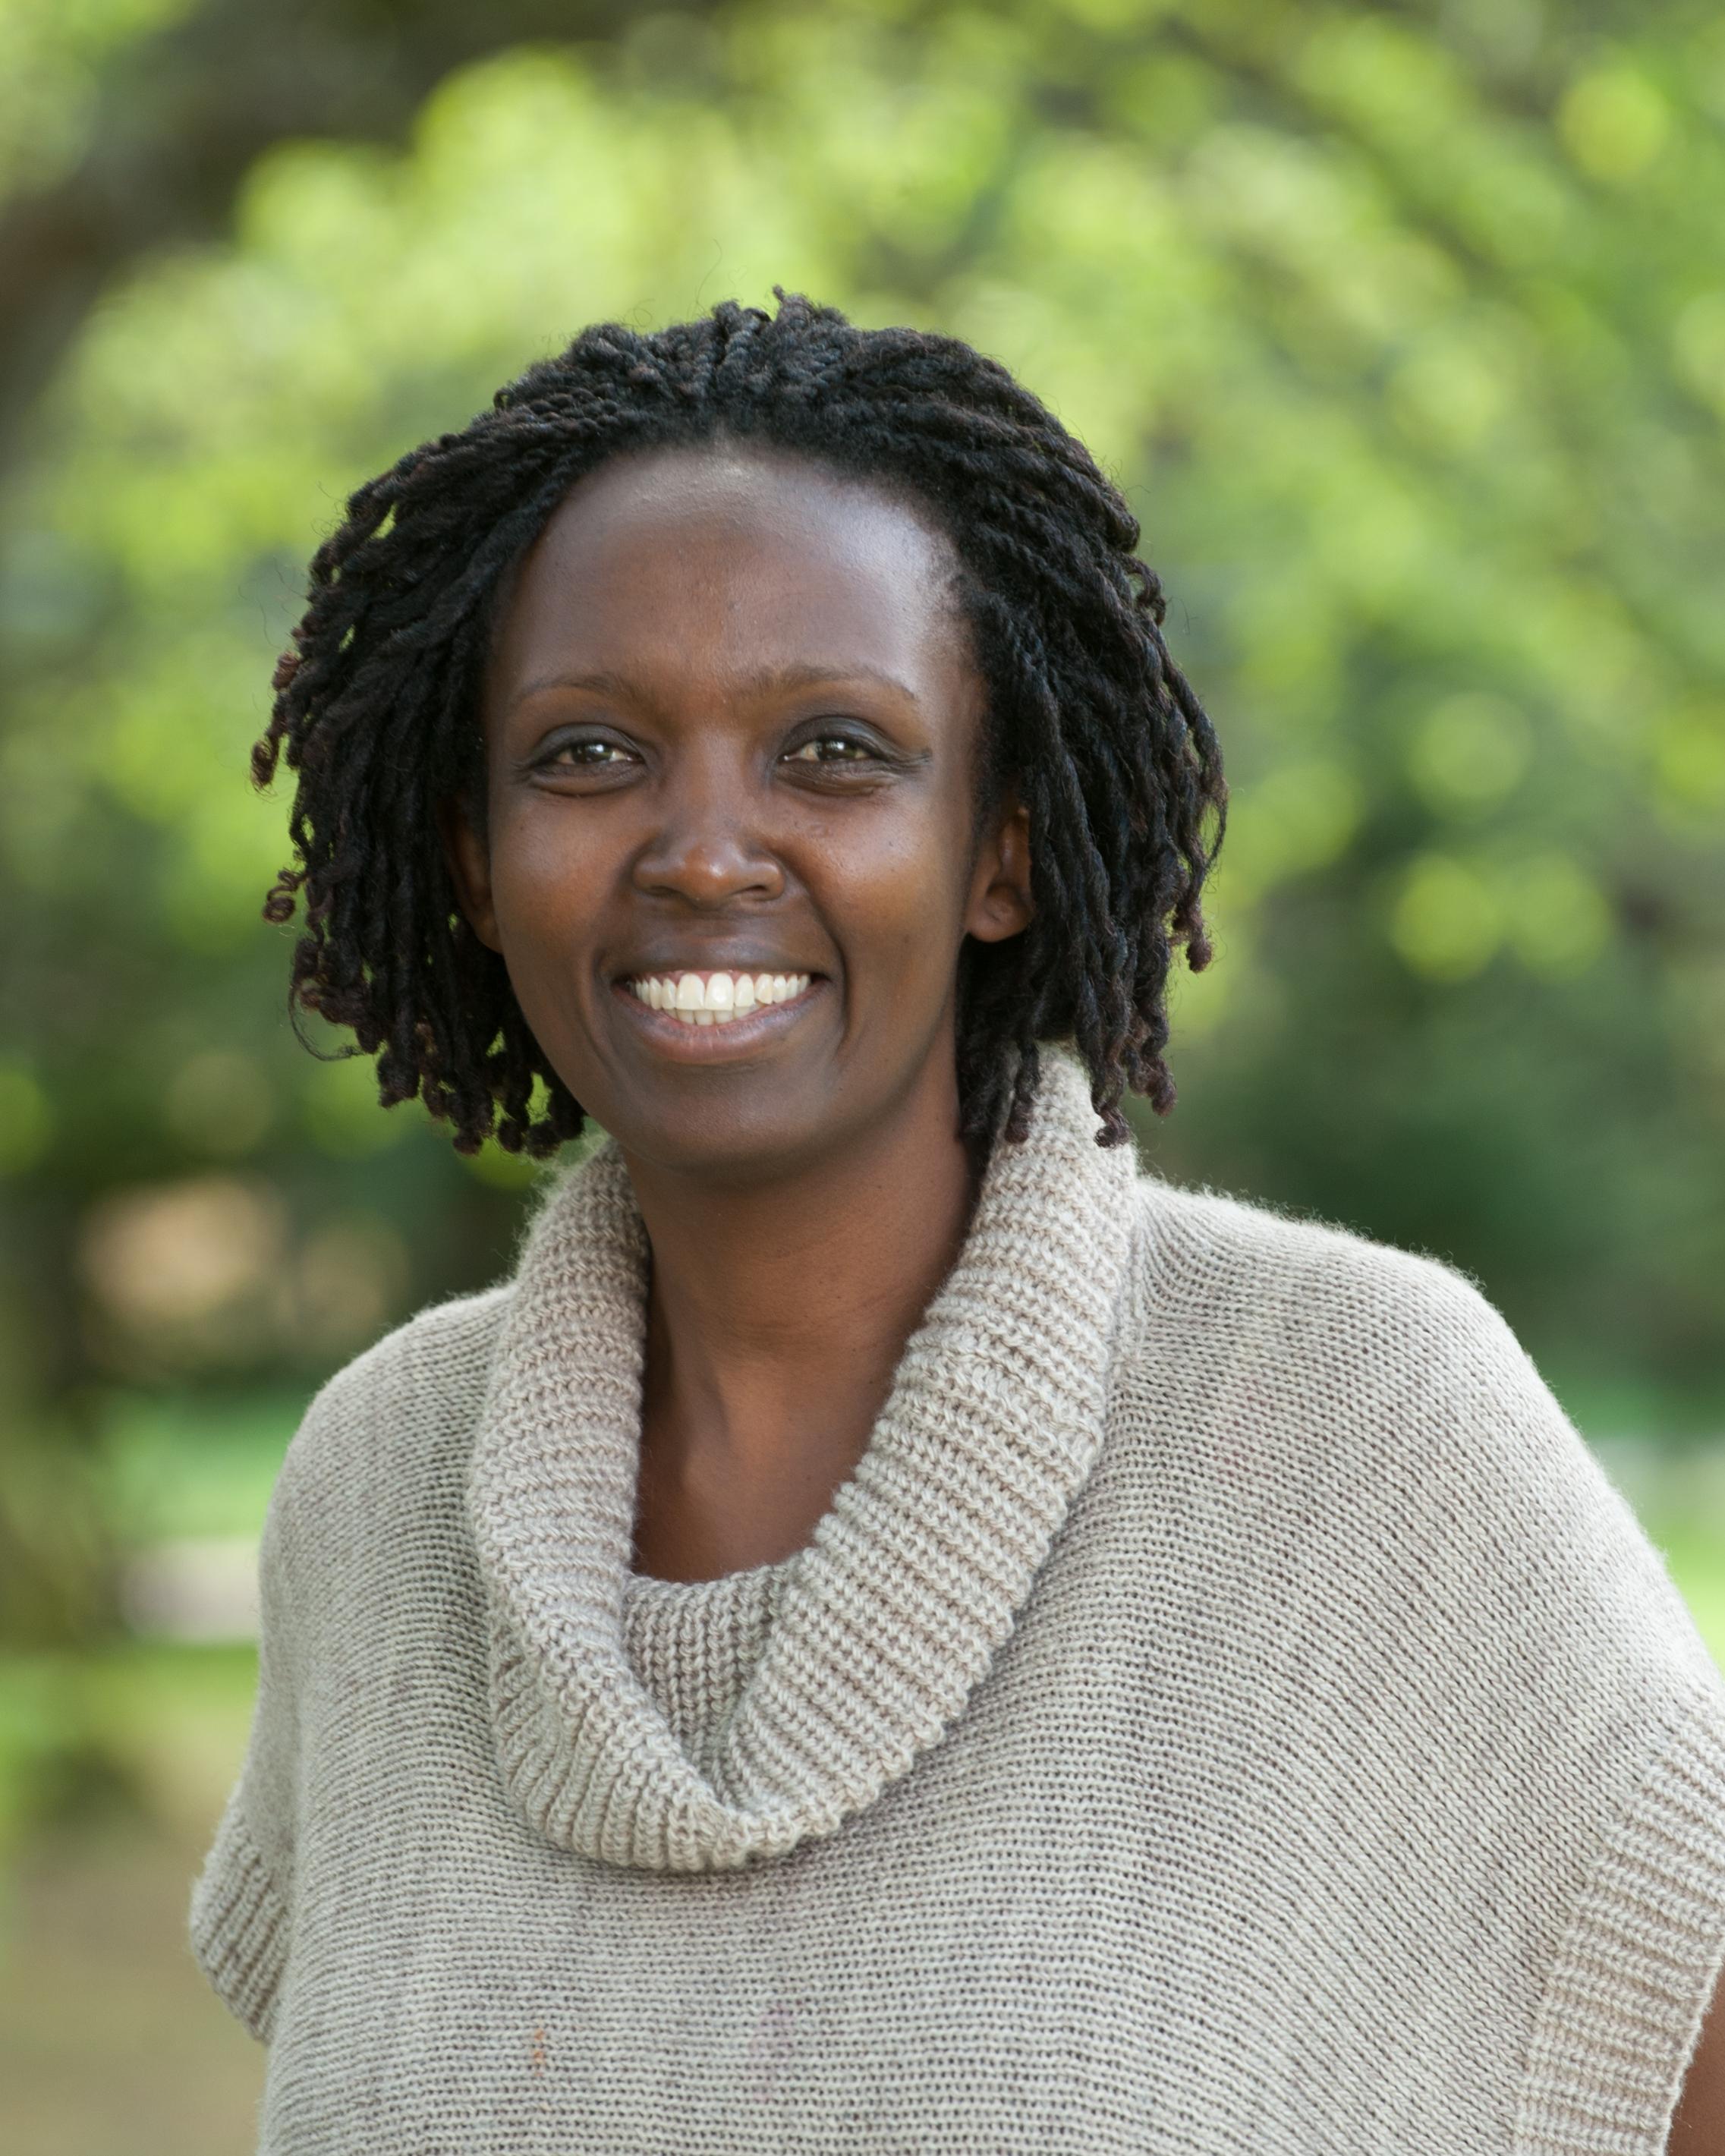 Connie Nshemereirwe